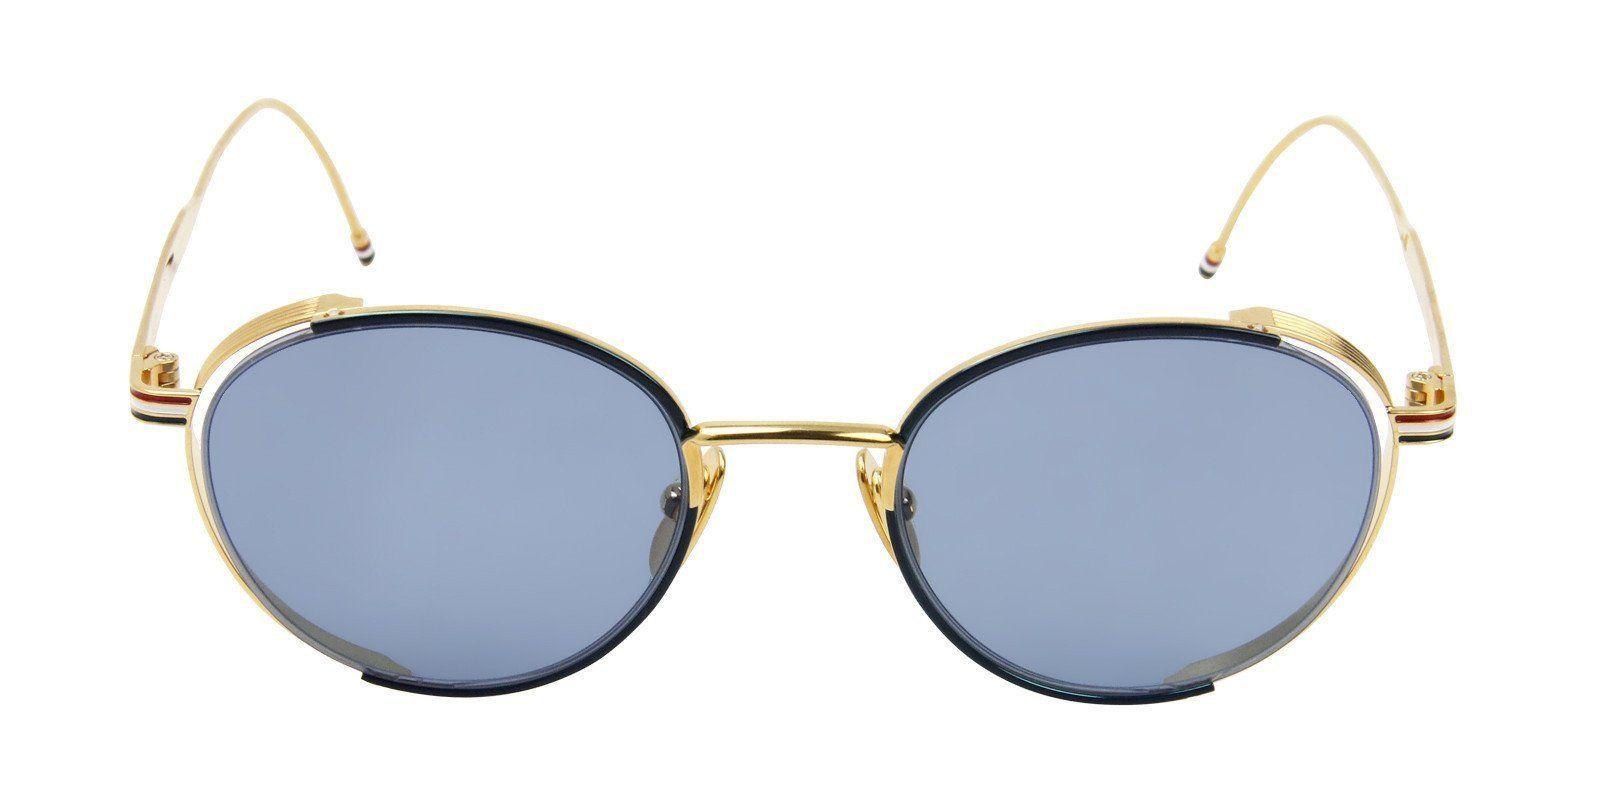 46f5b1170f0 Thom Browne - TB106C Gold - Blue sunglasses